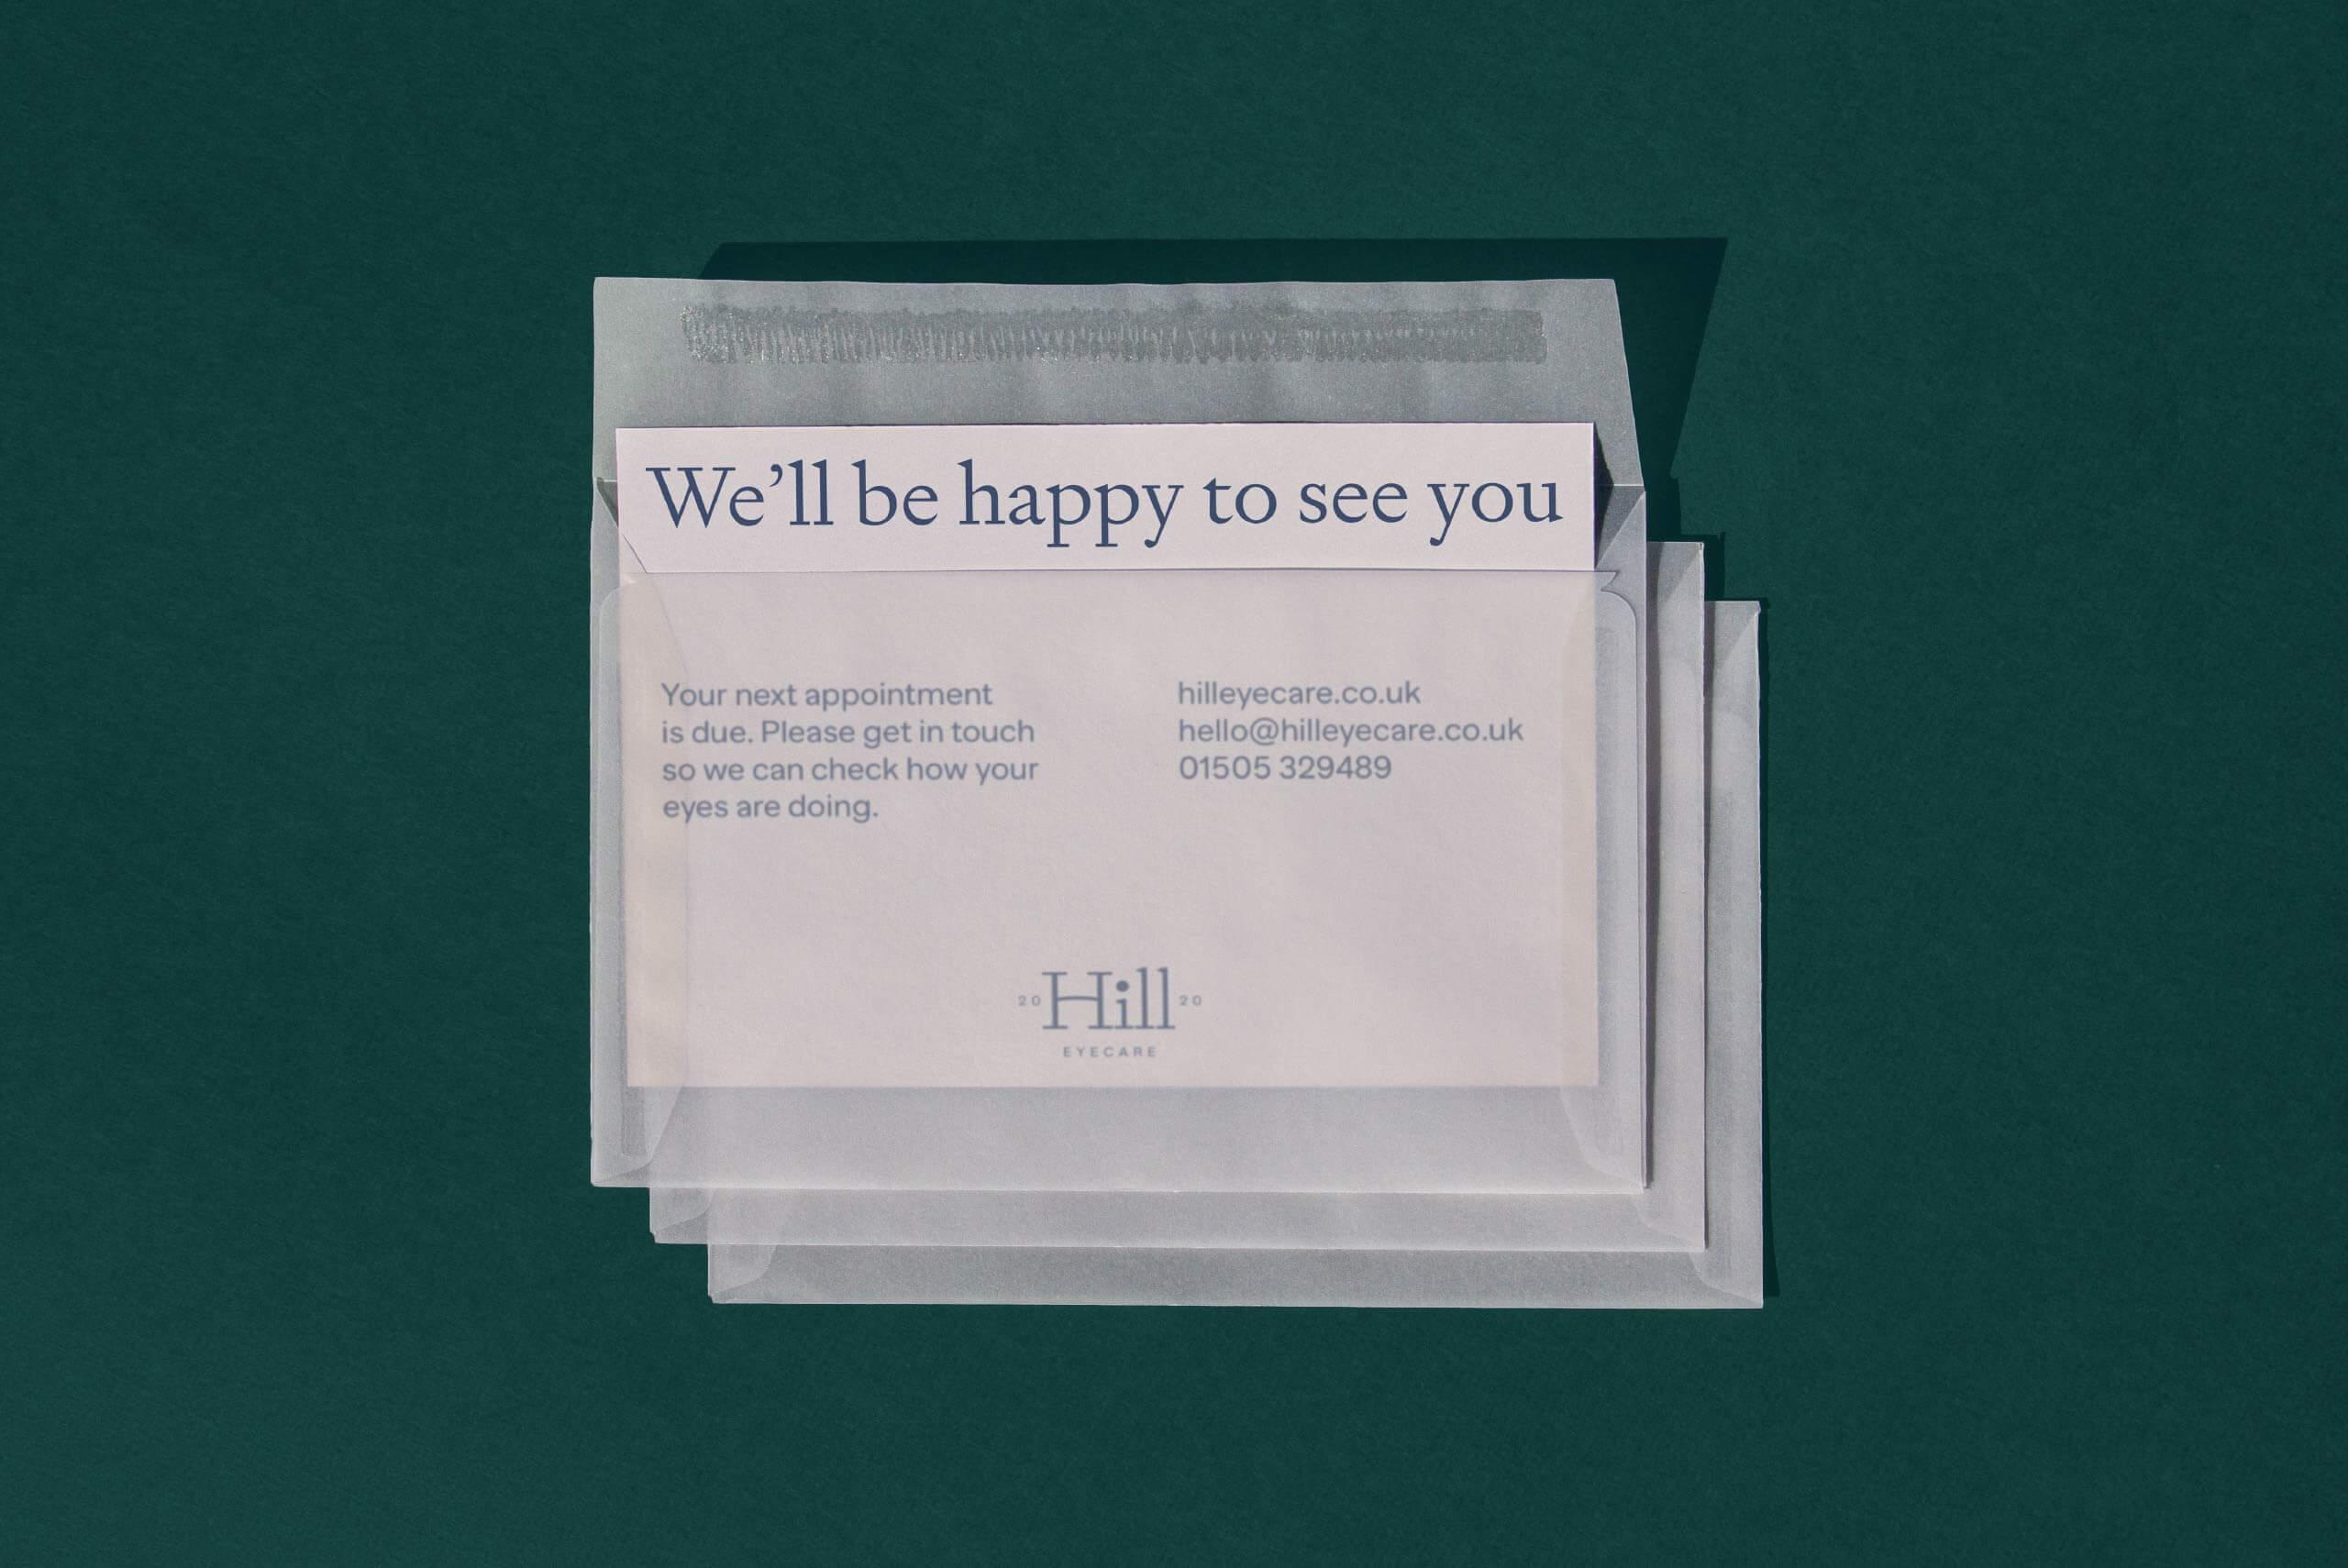 FRH-Hill-Eyecare1-copy-5